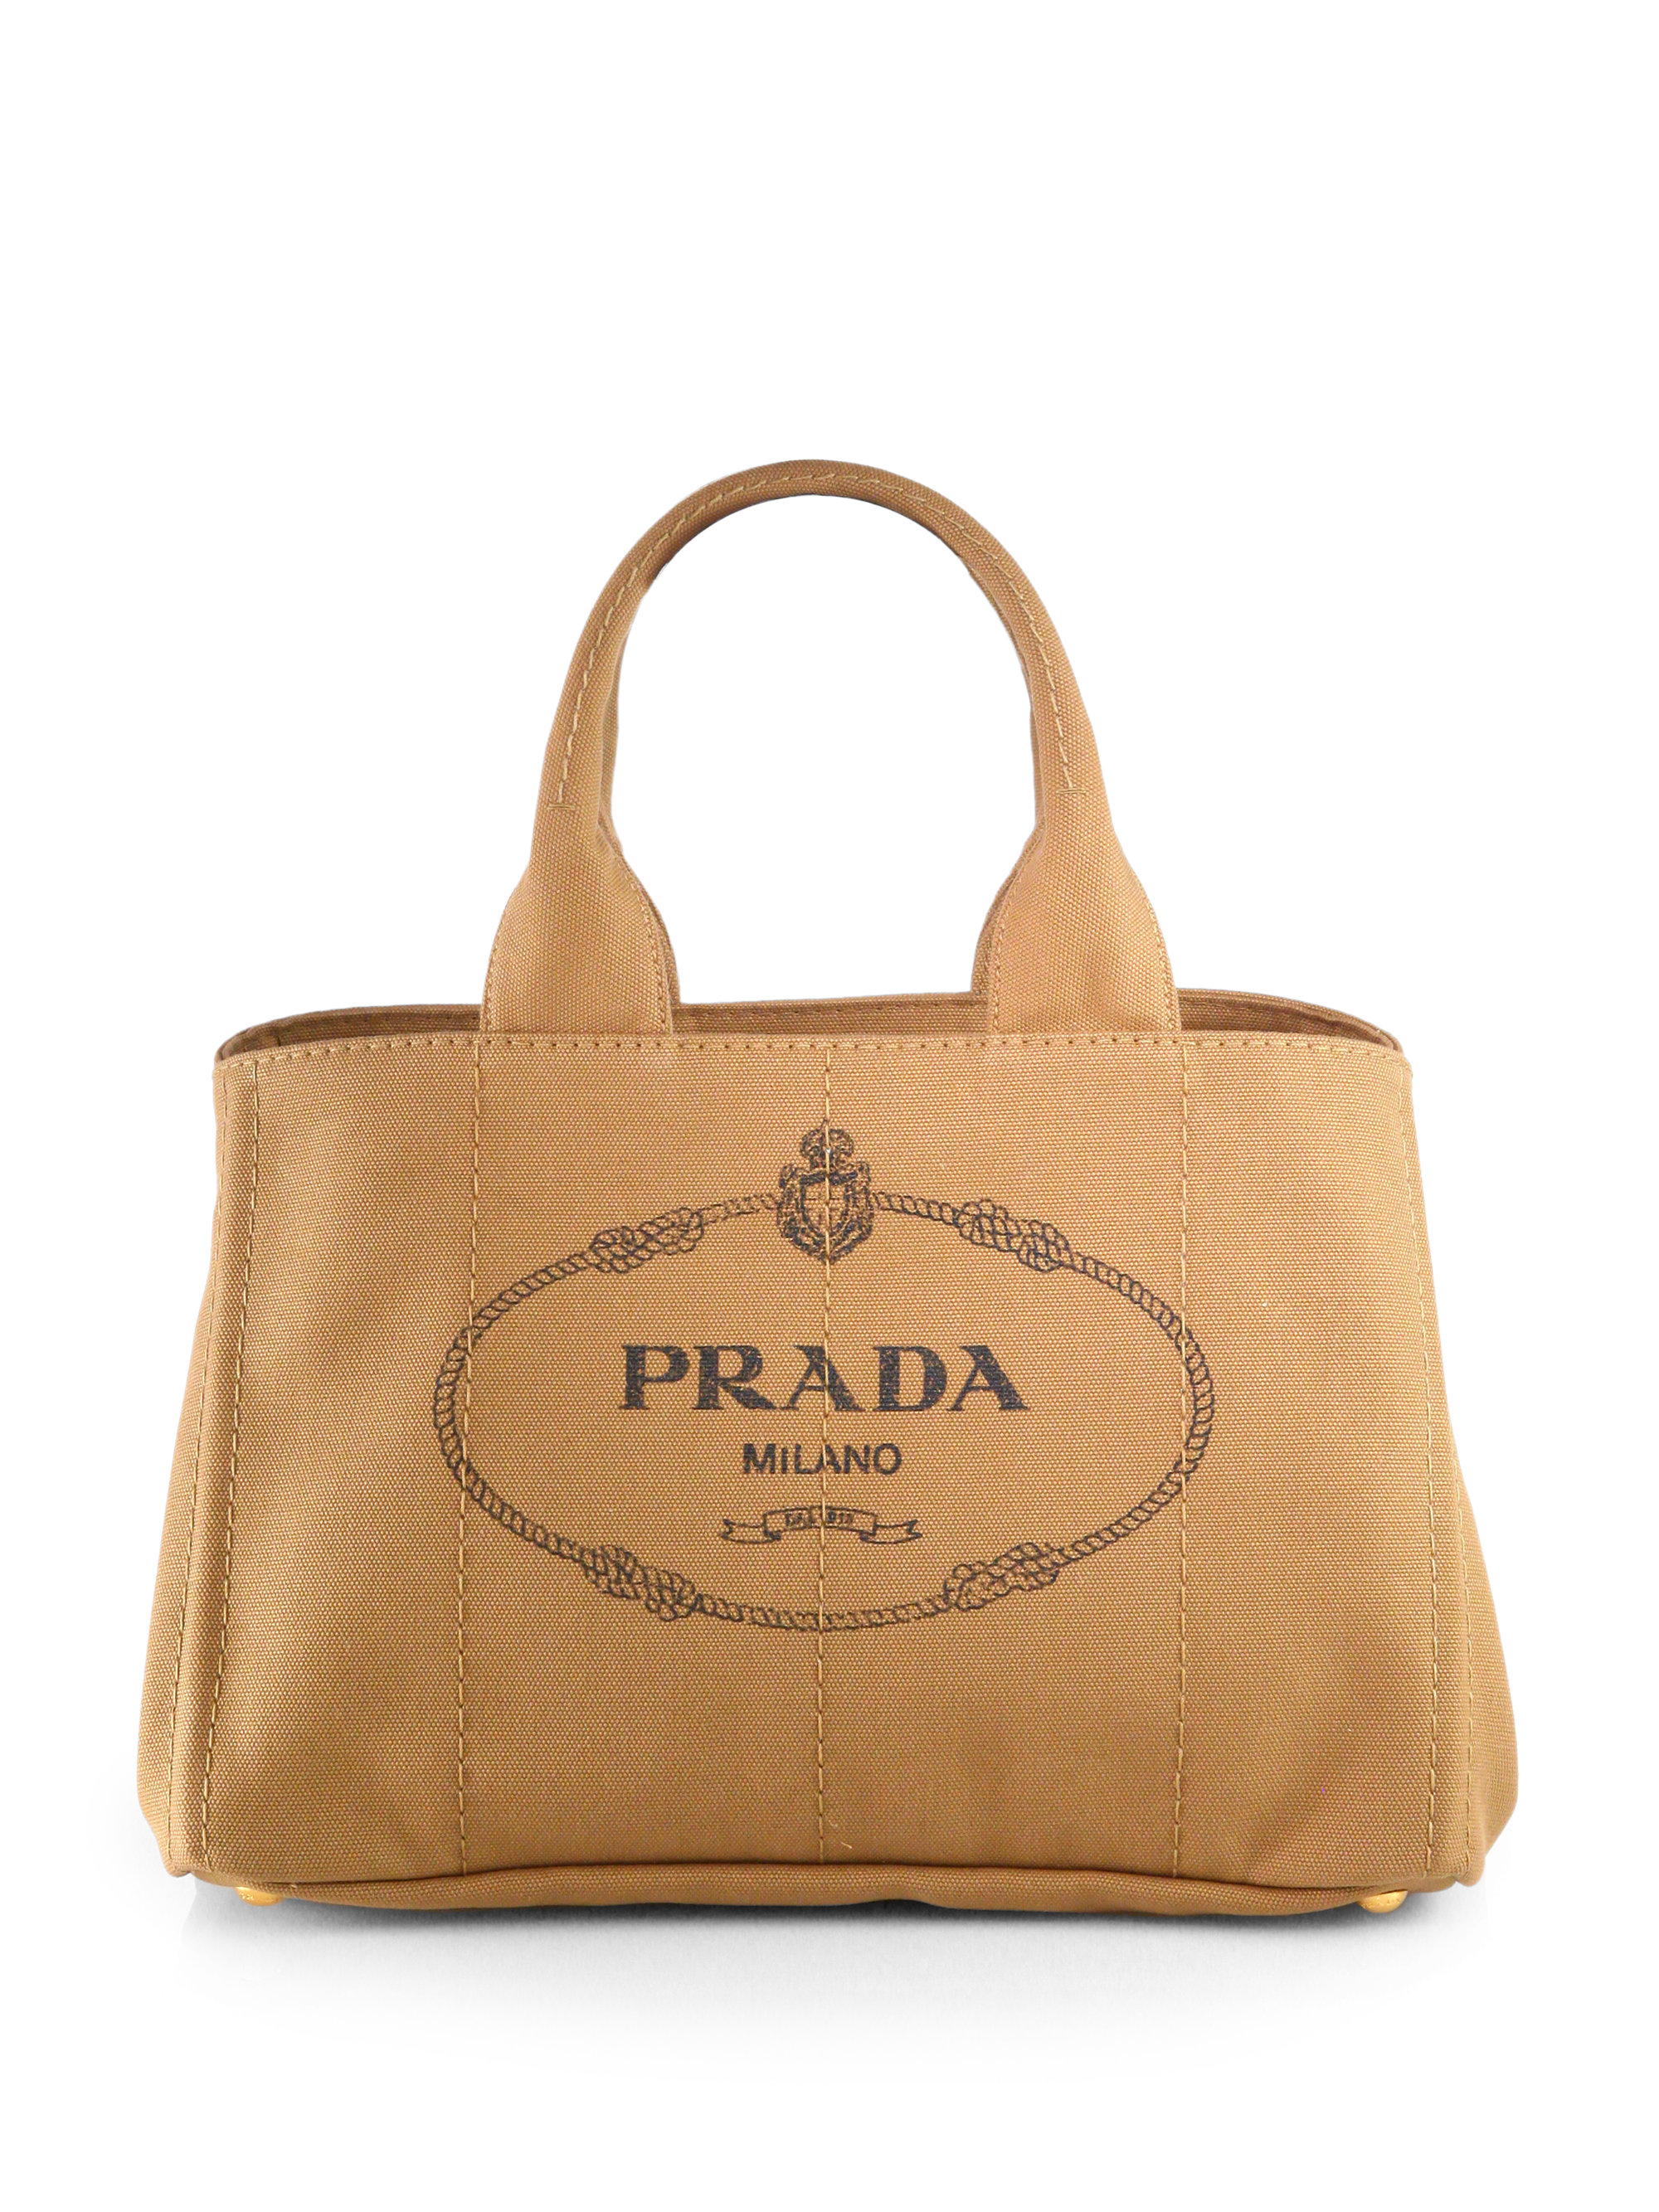 Prada Logo Printed Medium Canvas Tote in Brown | Lyst